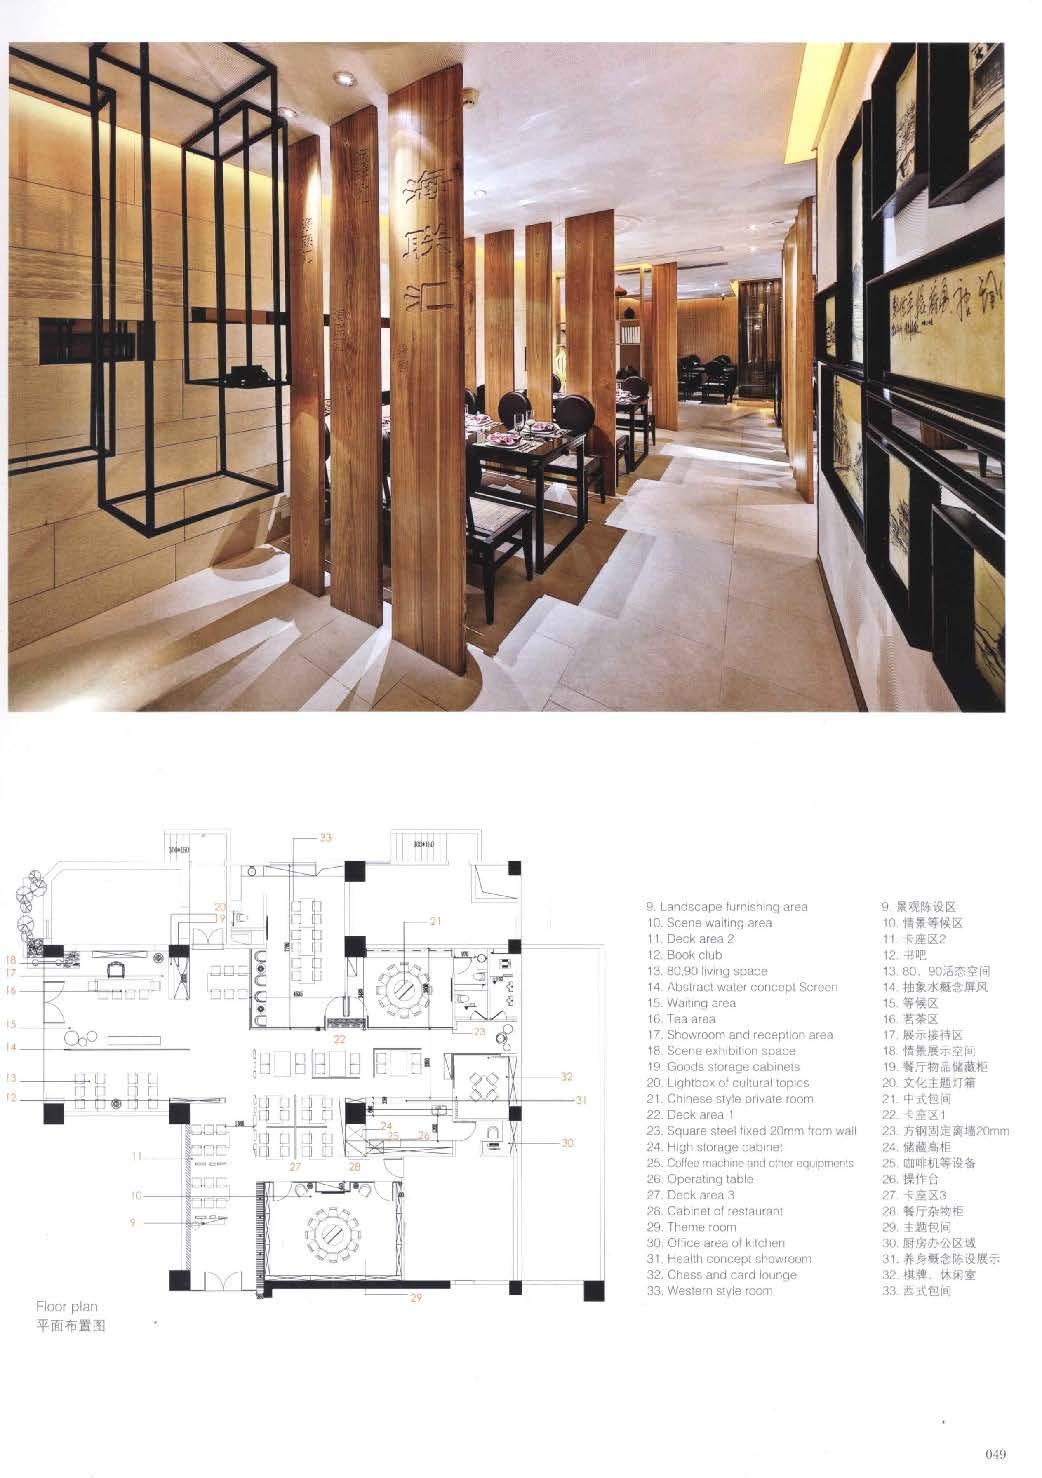 H073 东方风情 会所、餐饮细部解析_Page_047.jpg